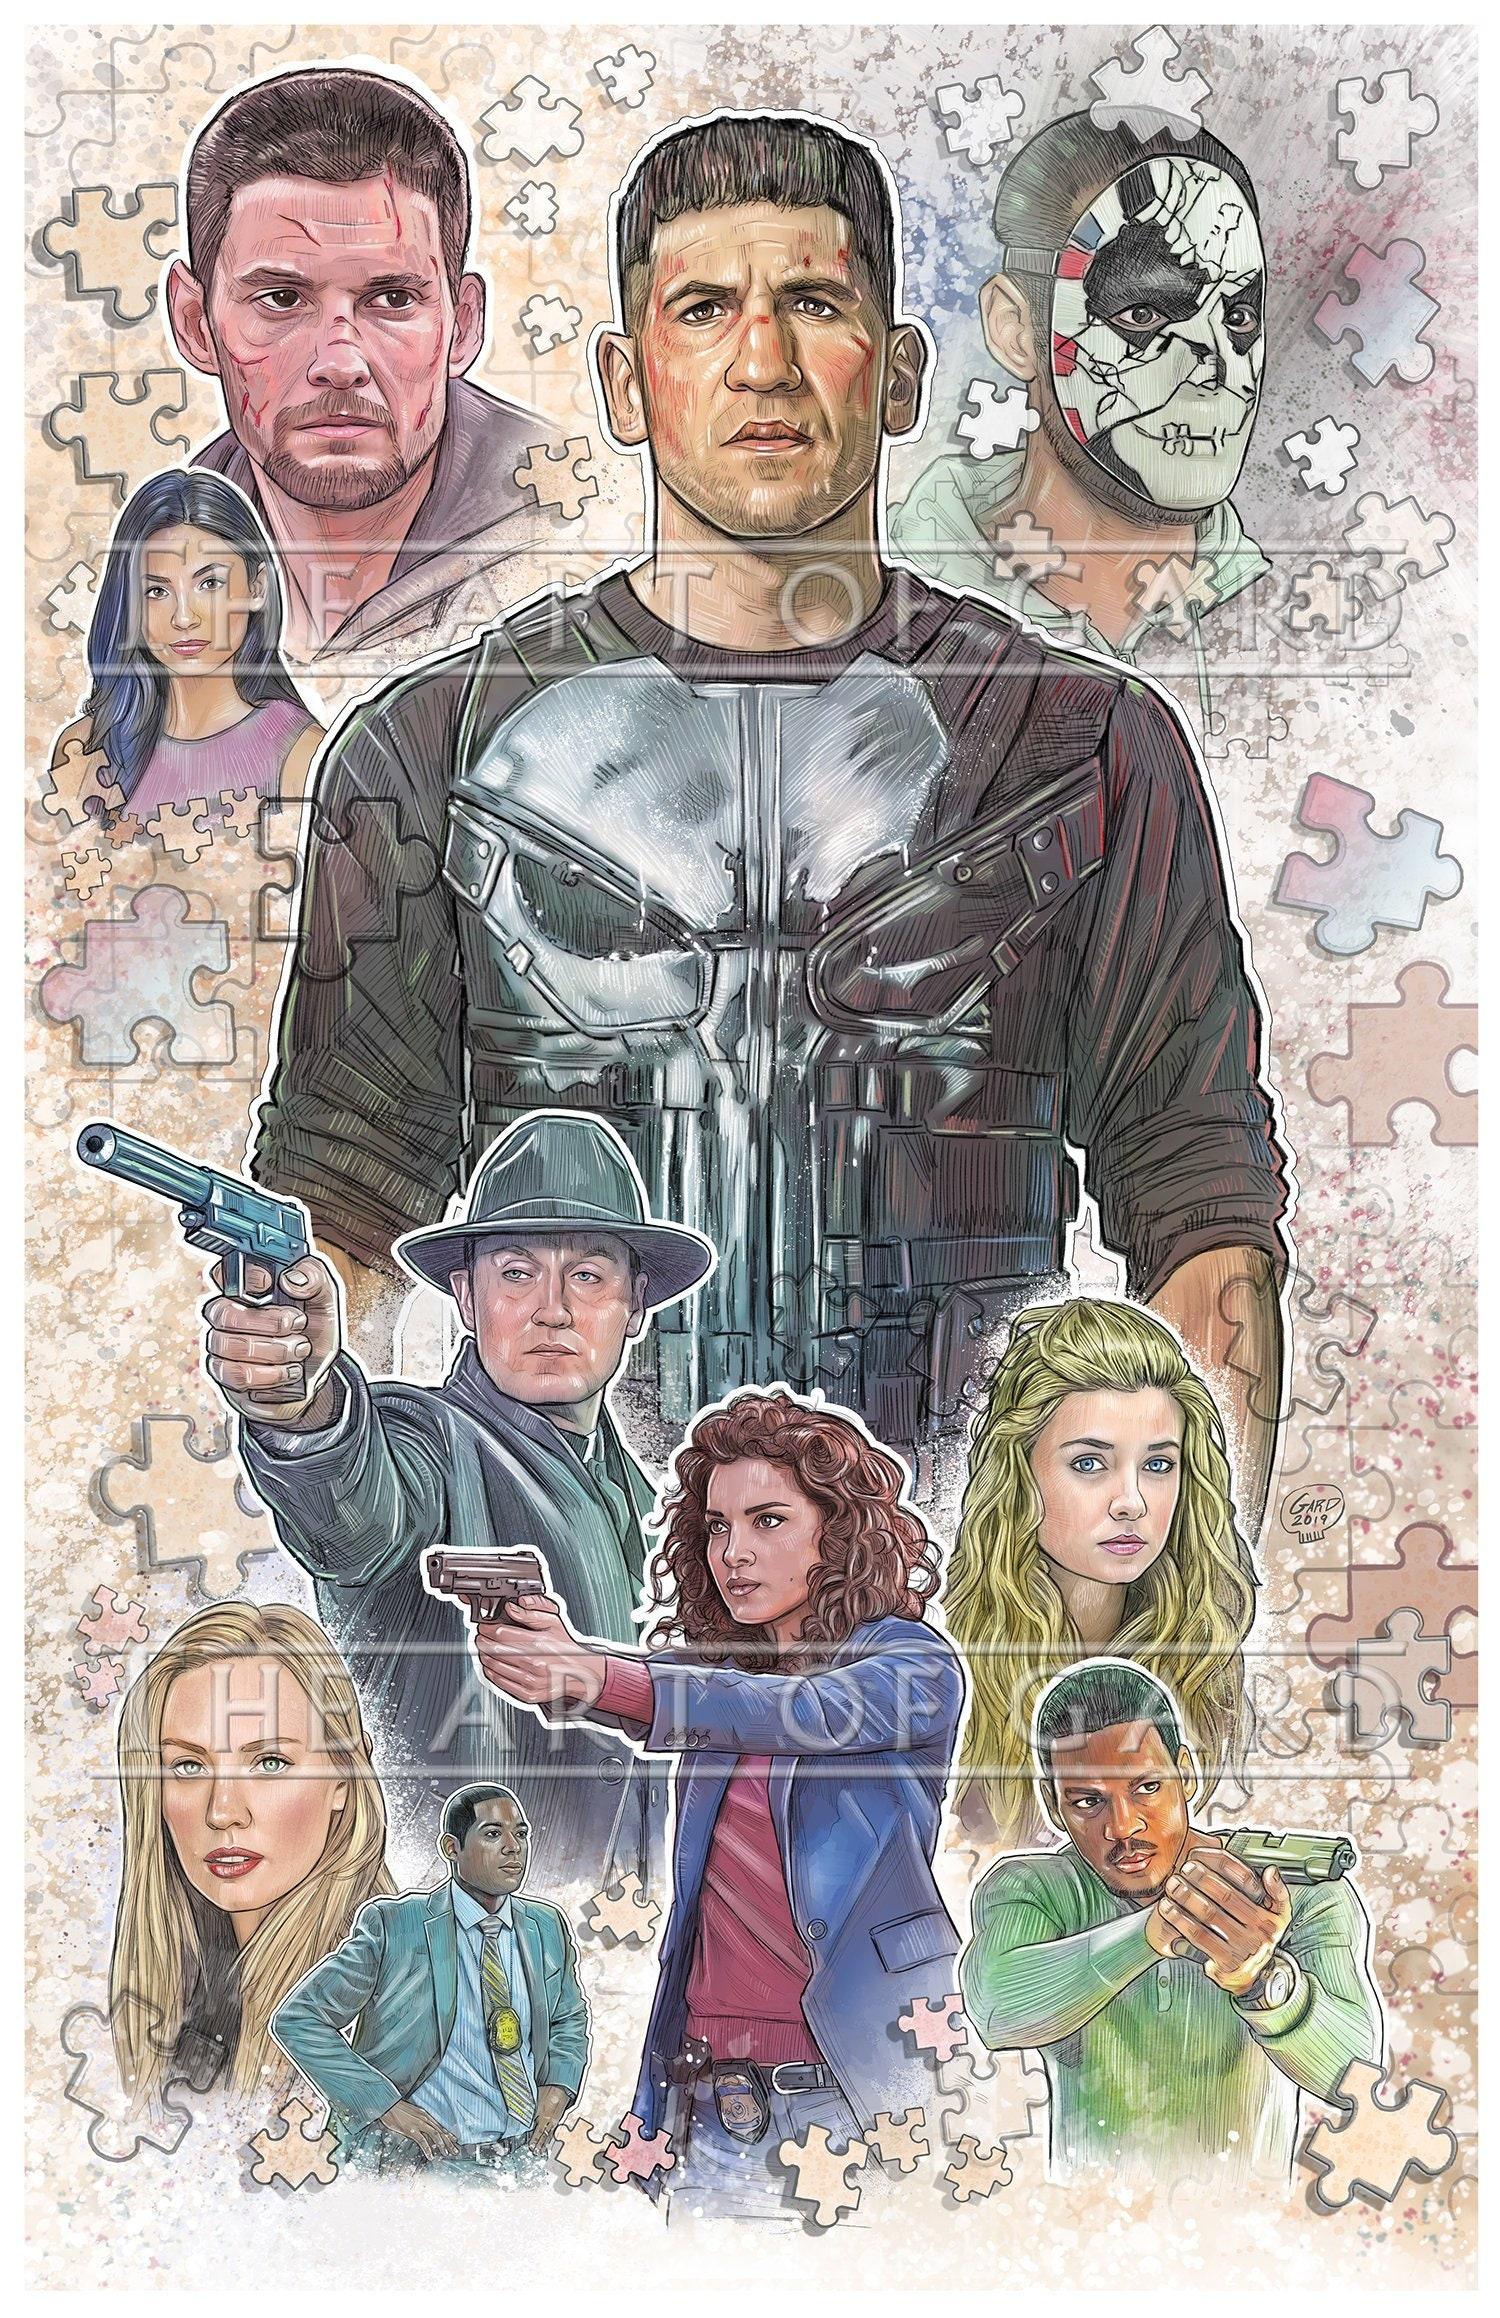 The Punisher Season 2 Collage